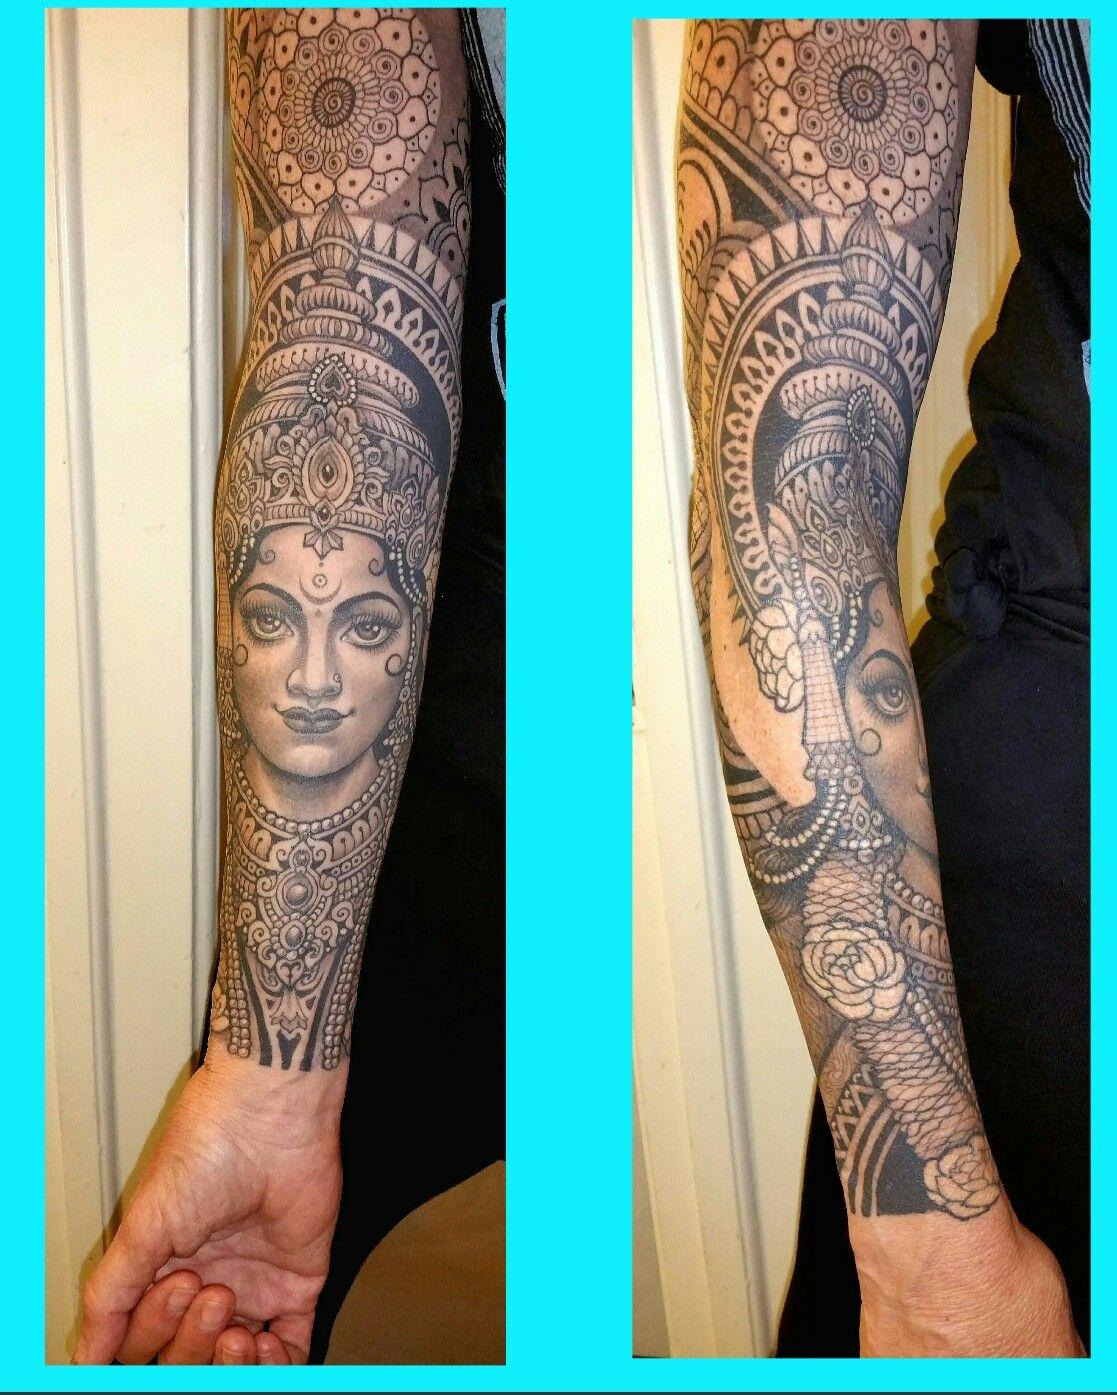 Da da danielle colby cushman tattoos - Best 25 Buddha Sleeve Tattoo Ideas On Pinterest Tattoo Po Tattoos Hockey And Hockey Tattoos